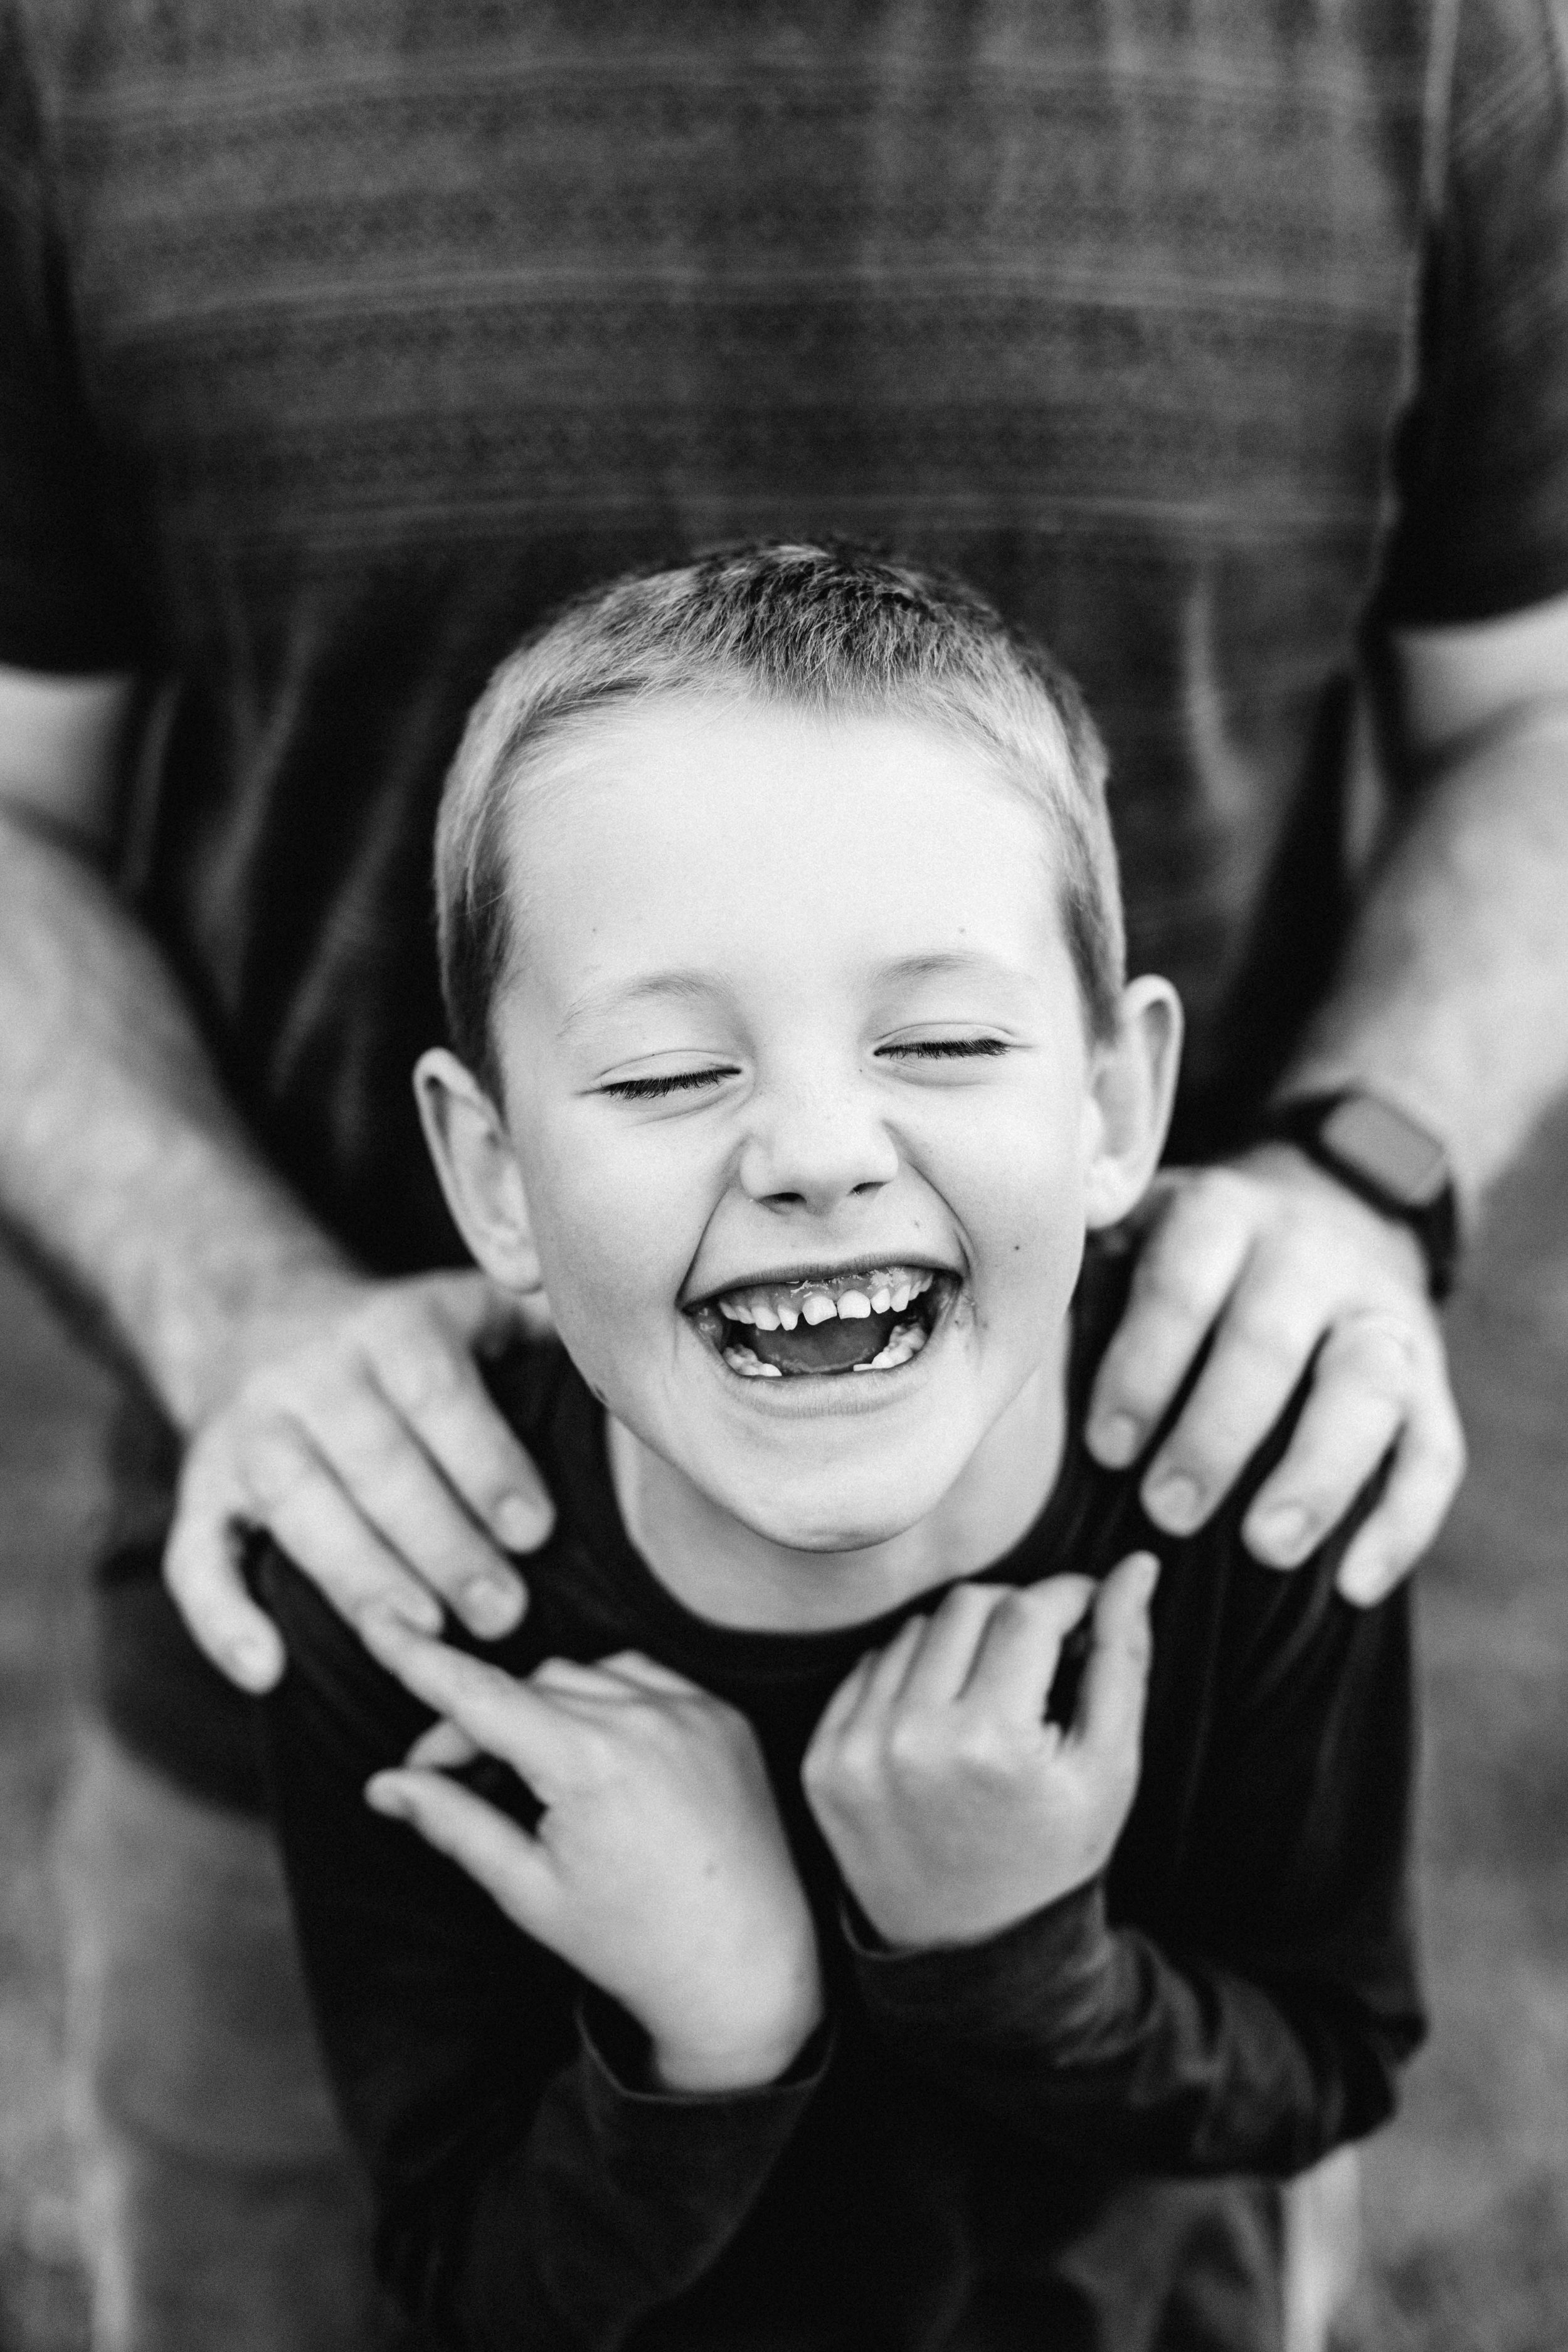 camden-family-photography-boot-family-session-21.jpg